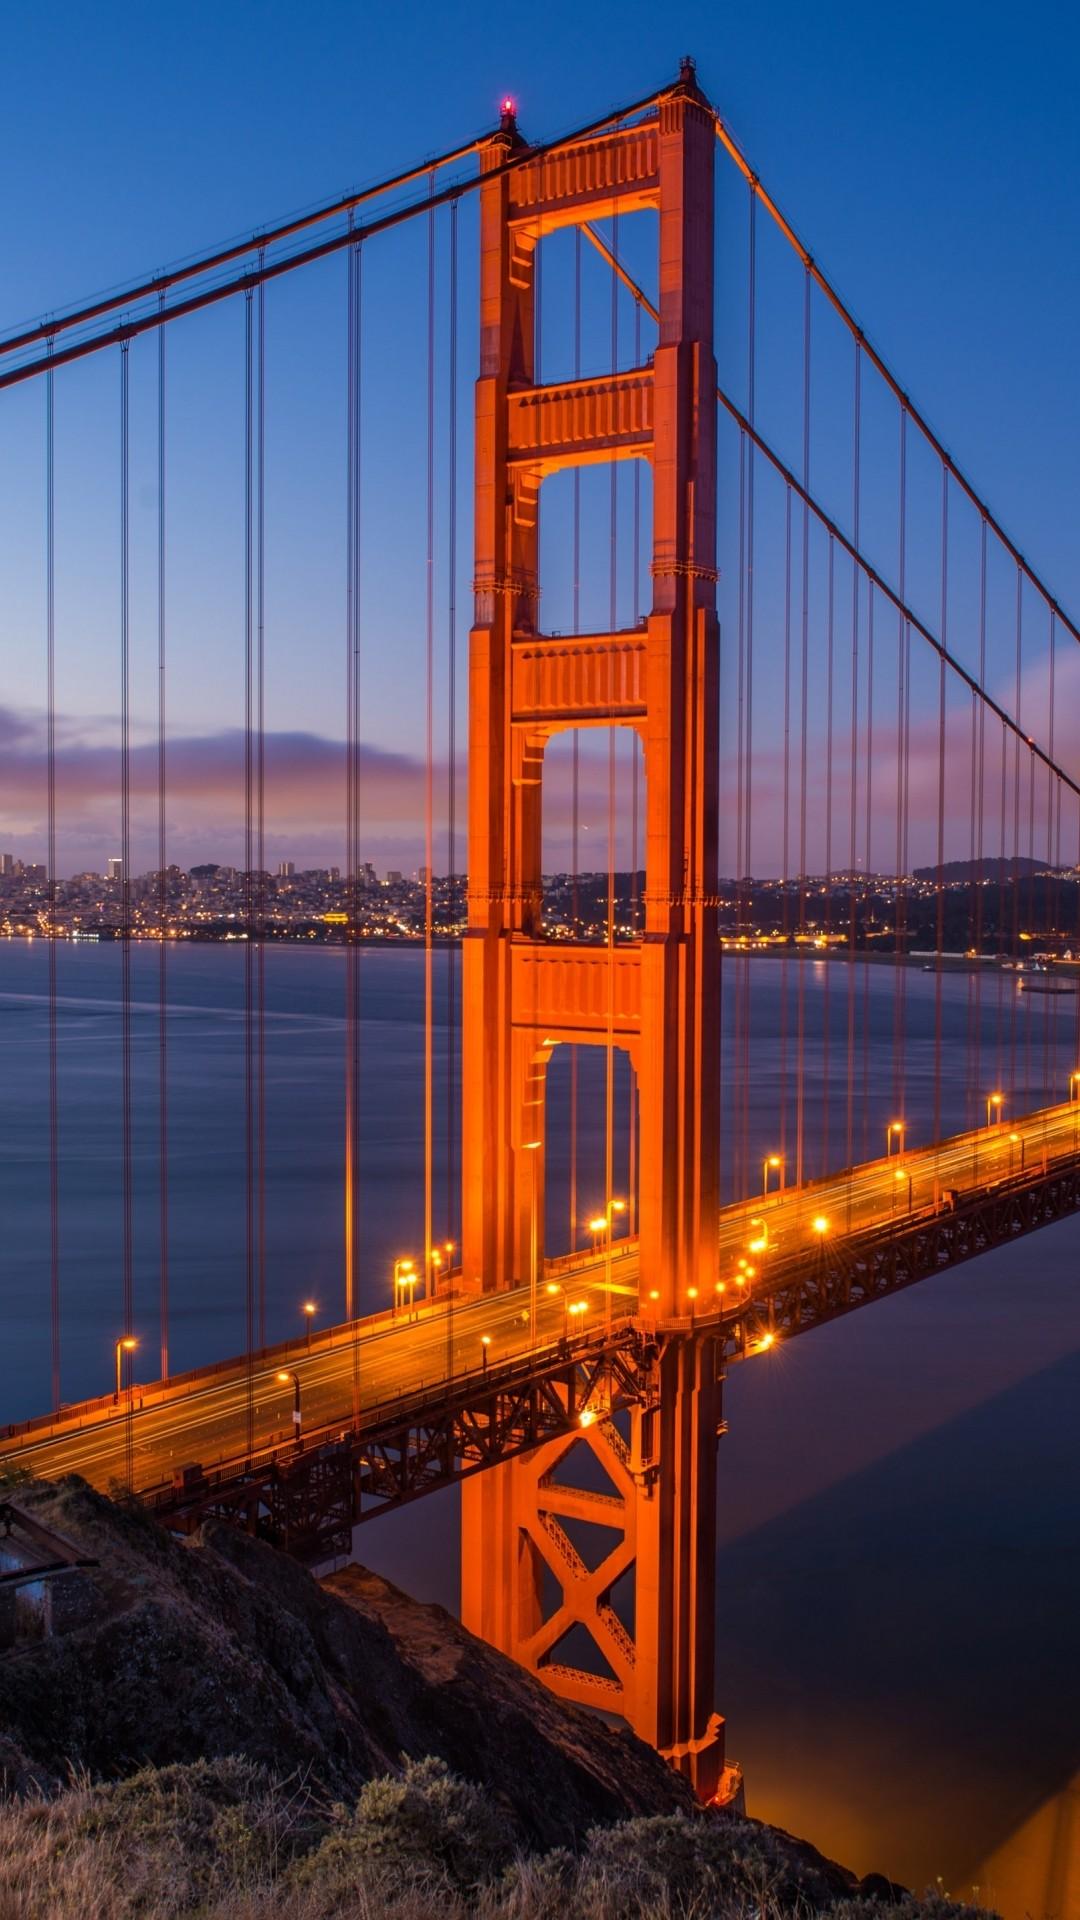 Golden Gate Bridge free wallpaper for android